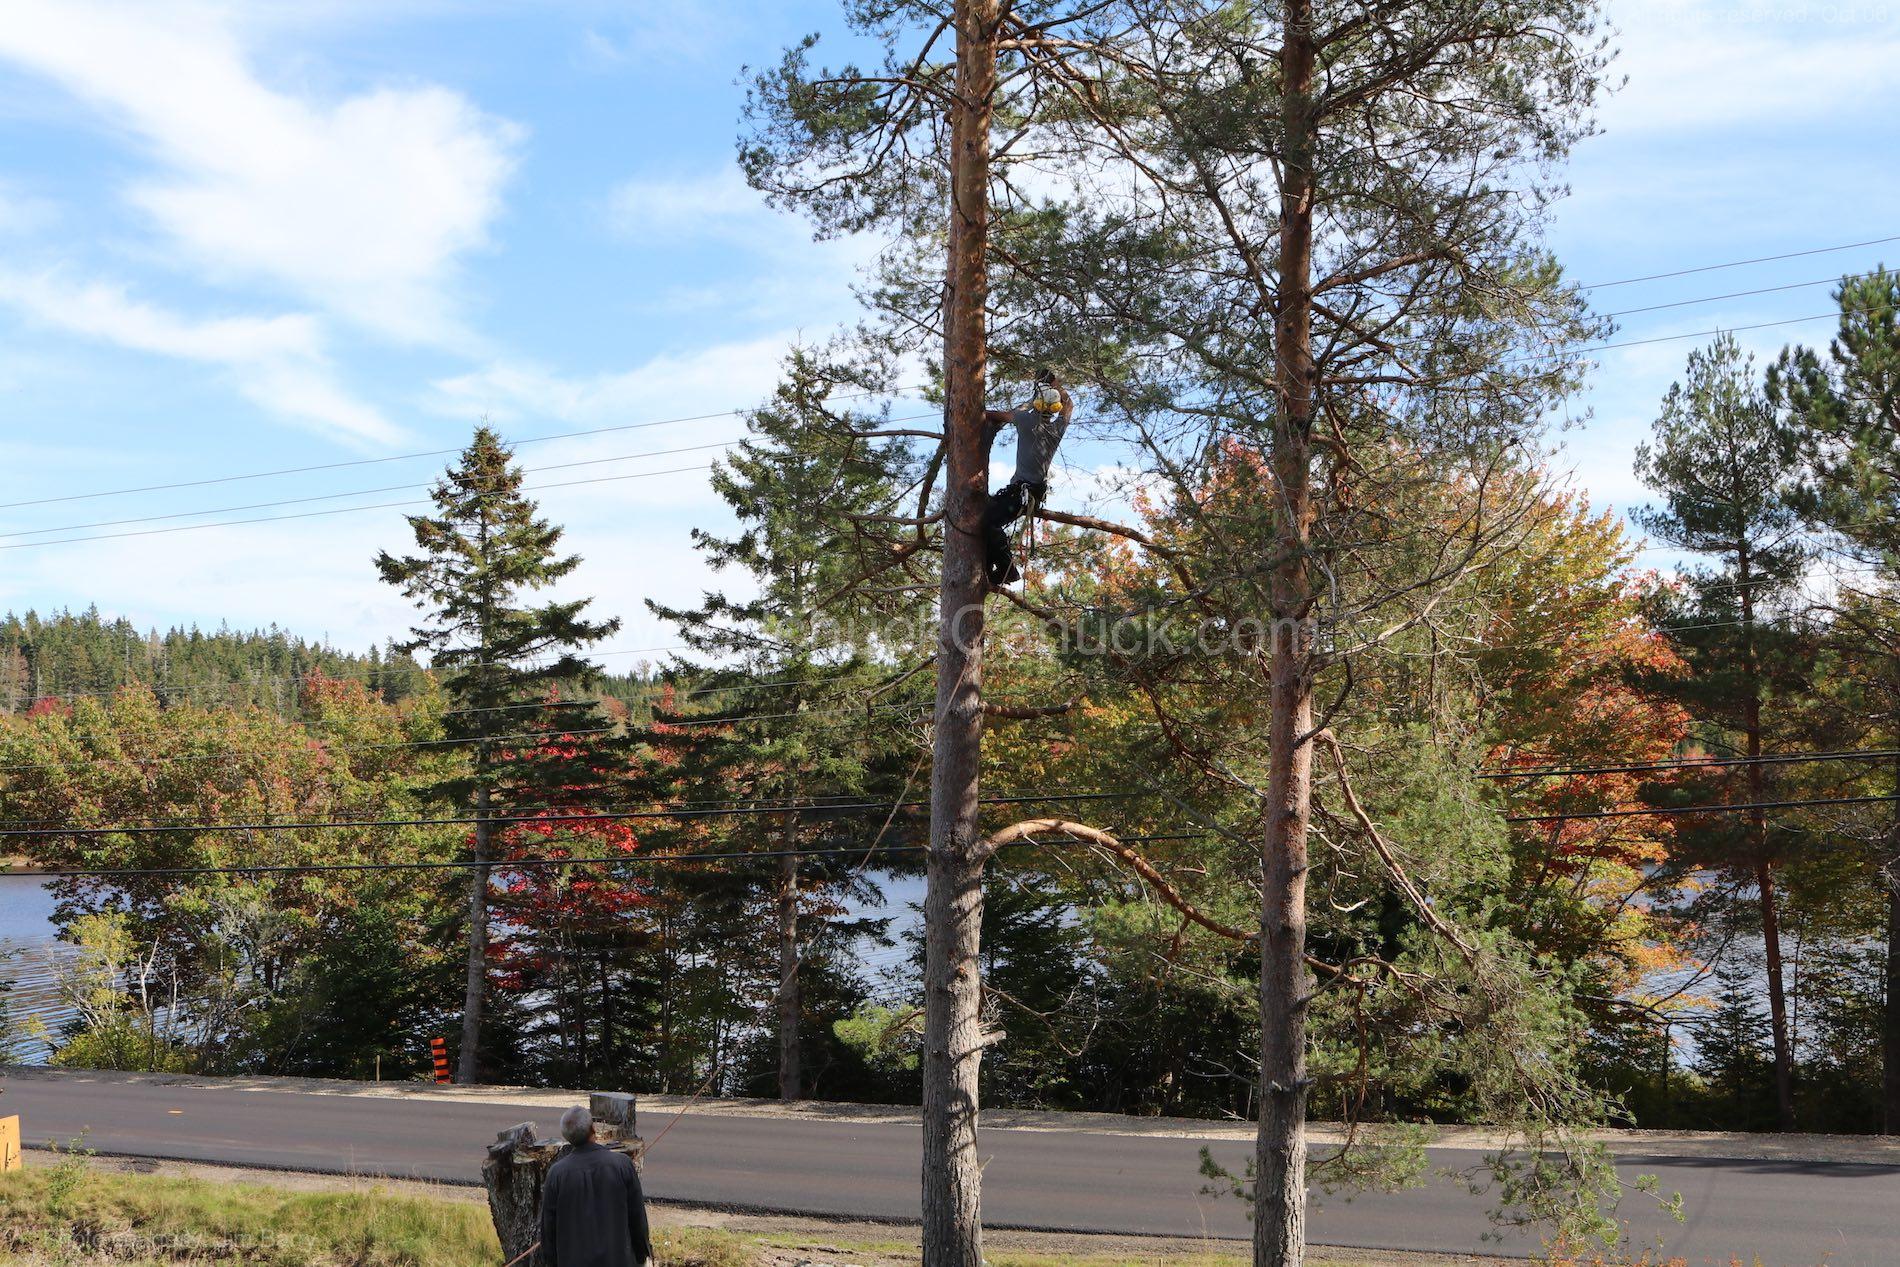 Felling pine trees